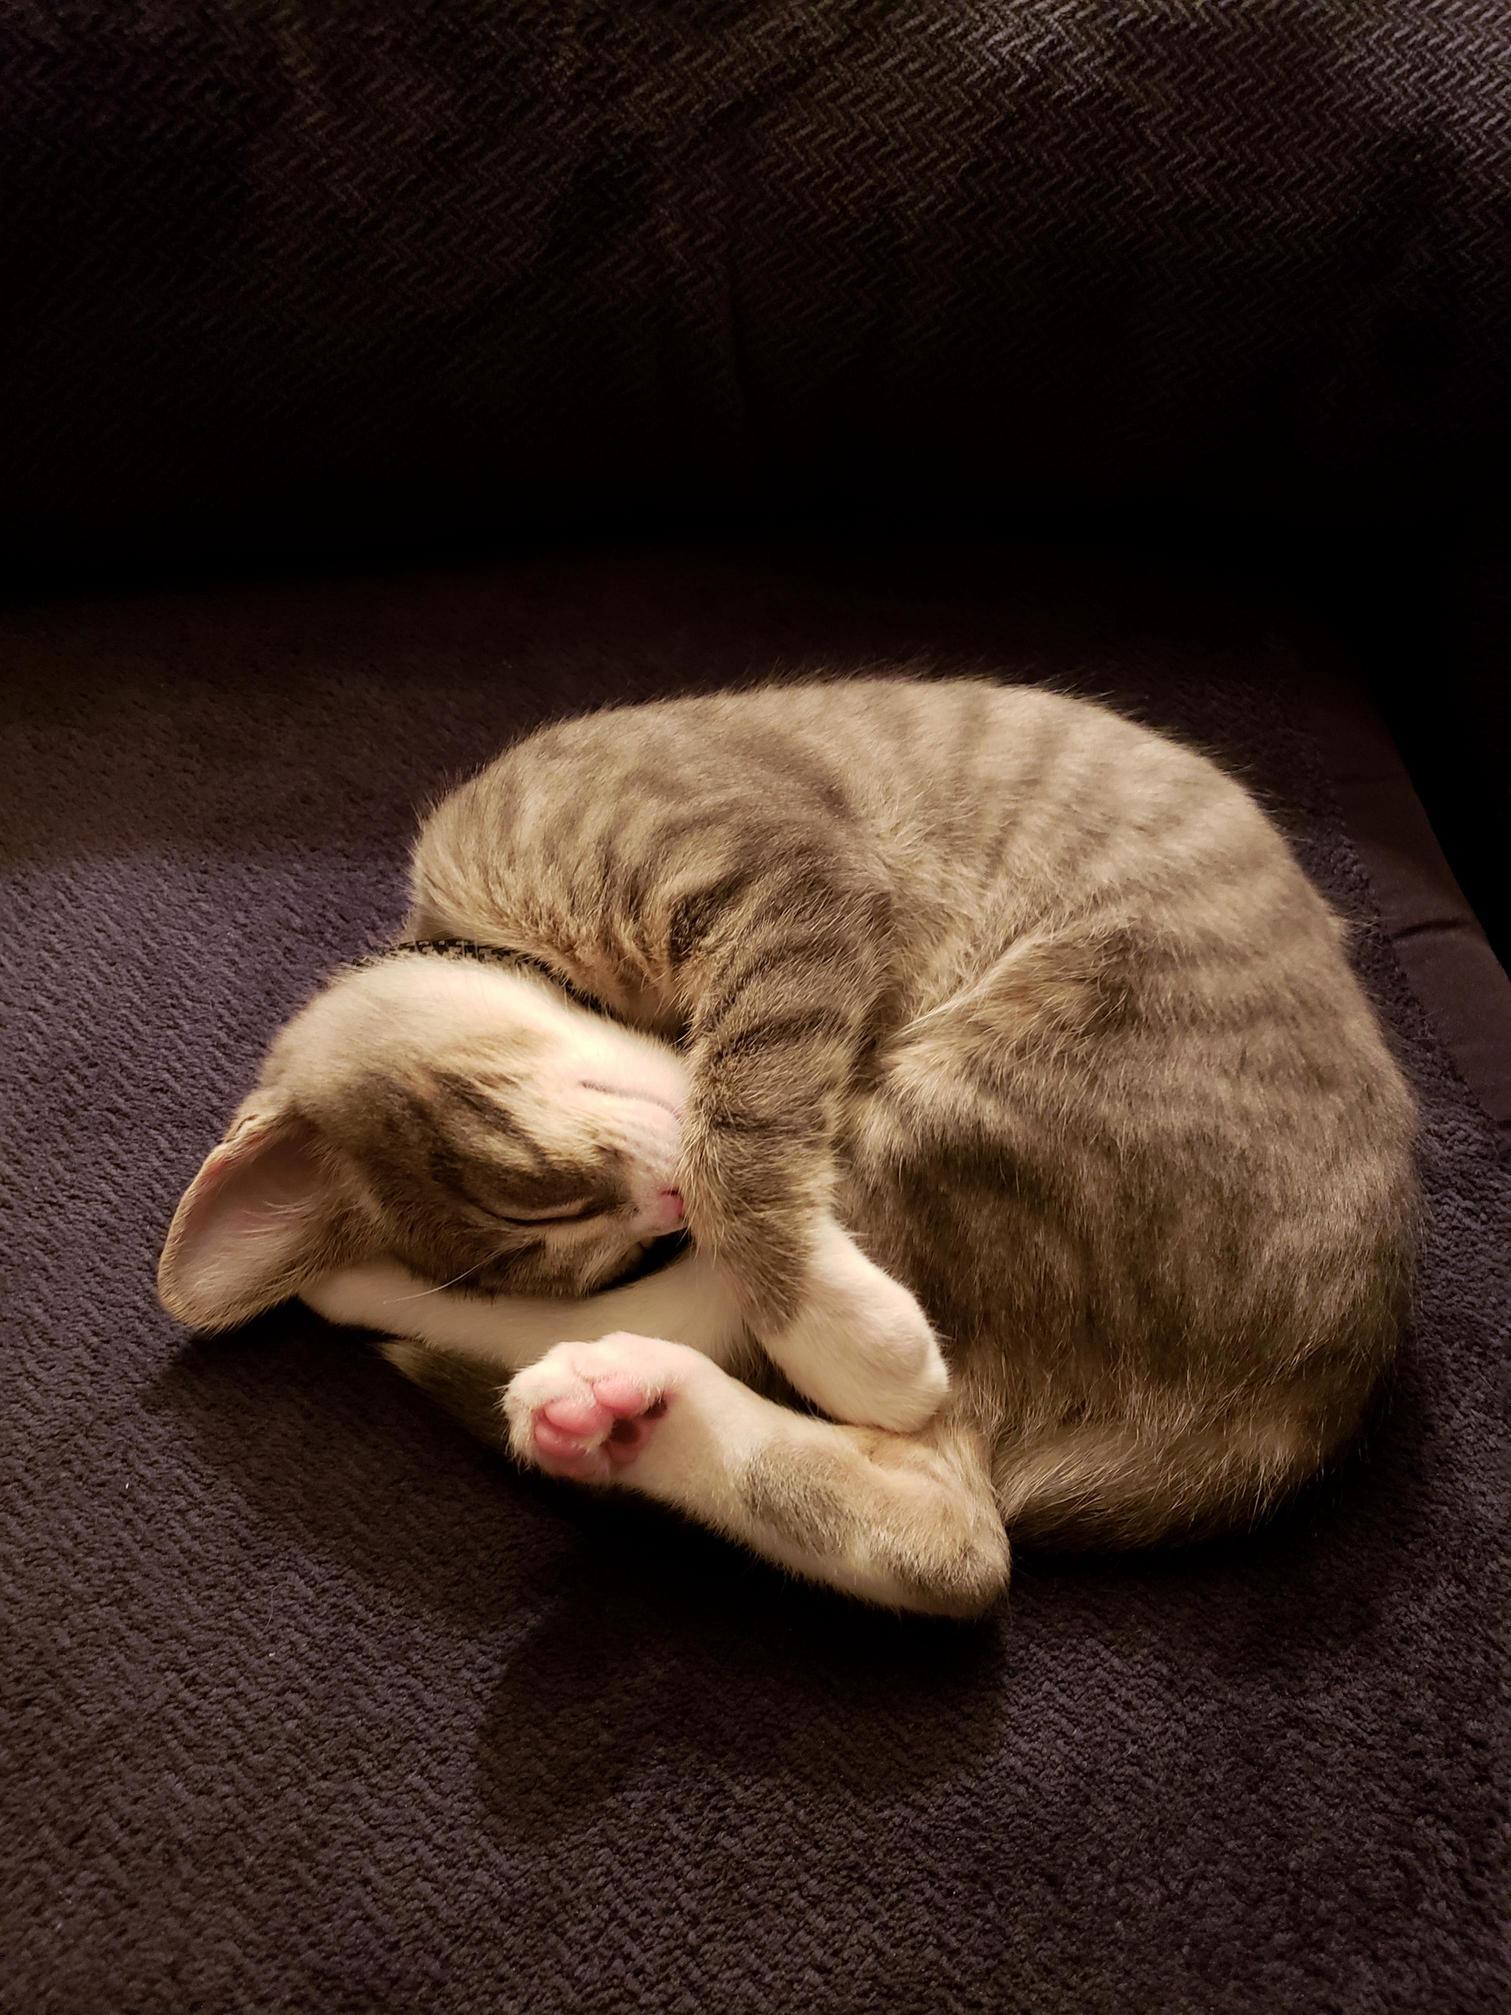 One of his favorite sleeping poses 